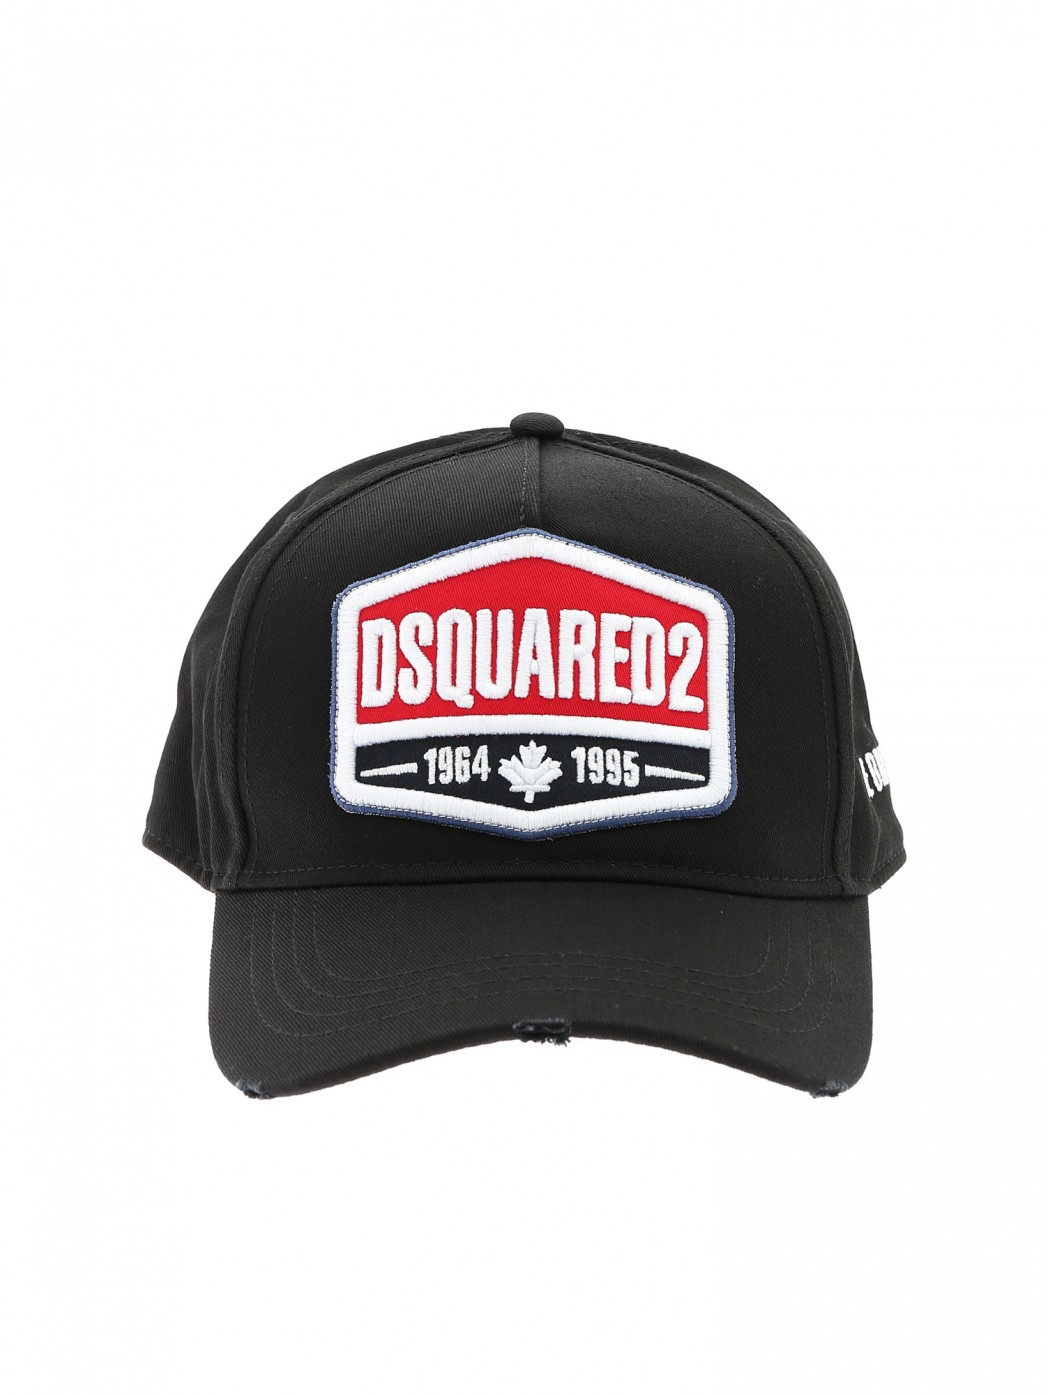 BASEBALL CAP DSQUARED2 BCM044005C00001 2124